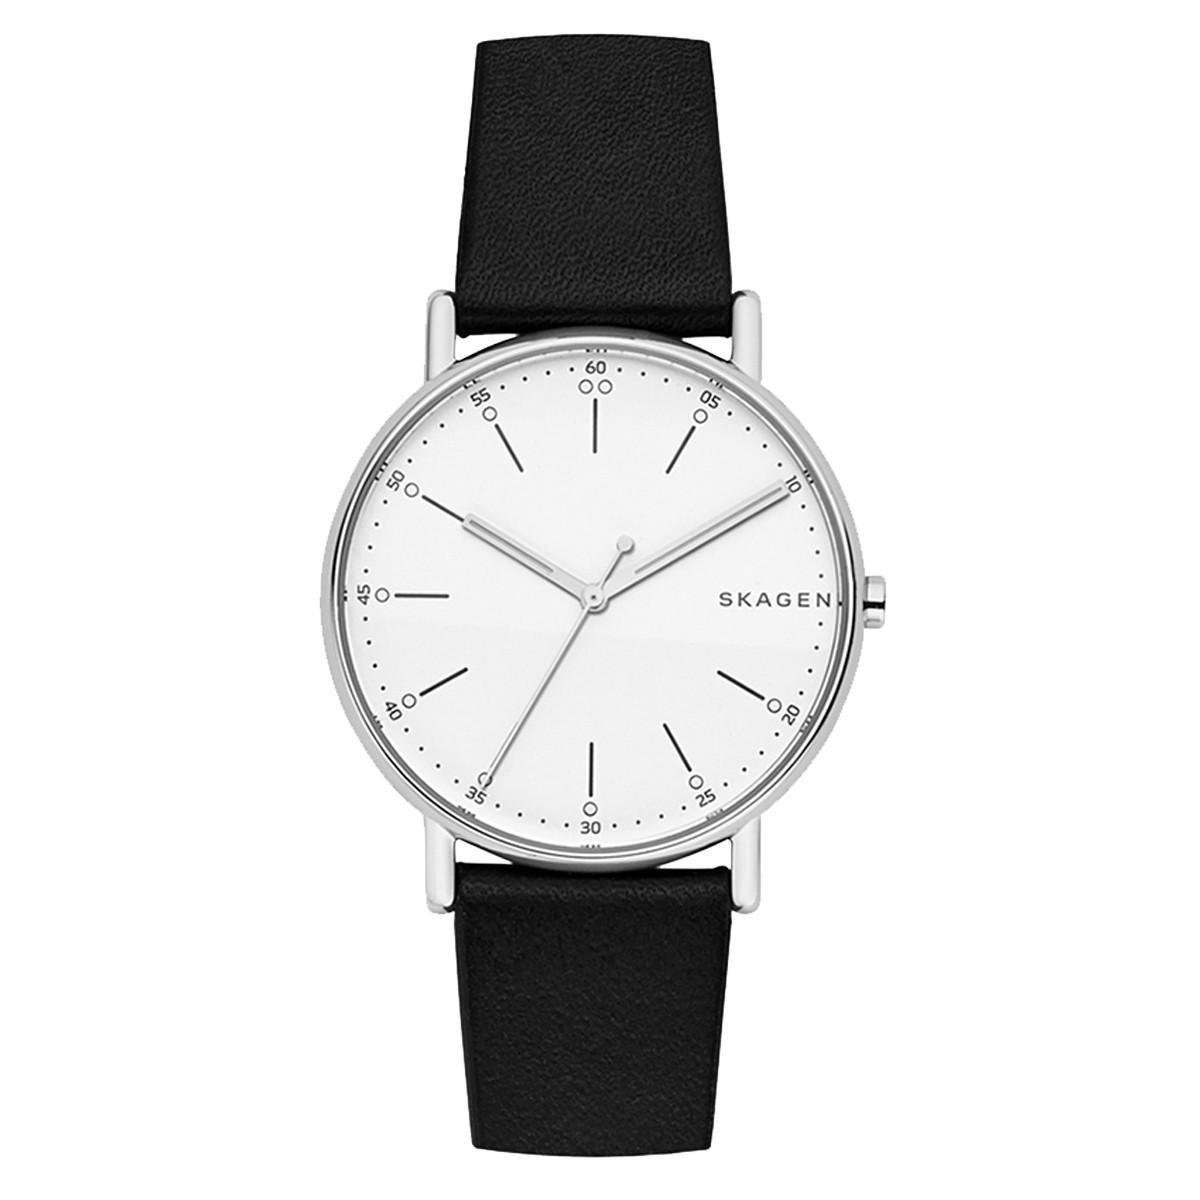 Relógio Skagen Signatur SKW6353 2BN - Compre Agora   Zattini b816ccbbd6